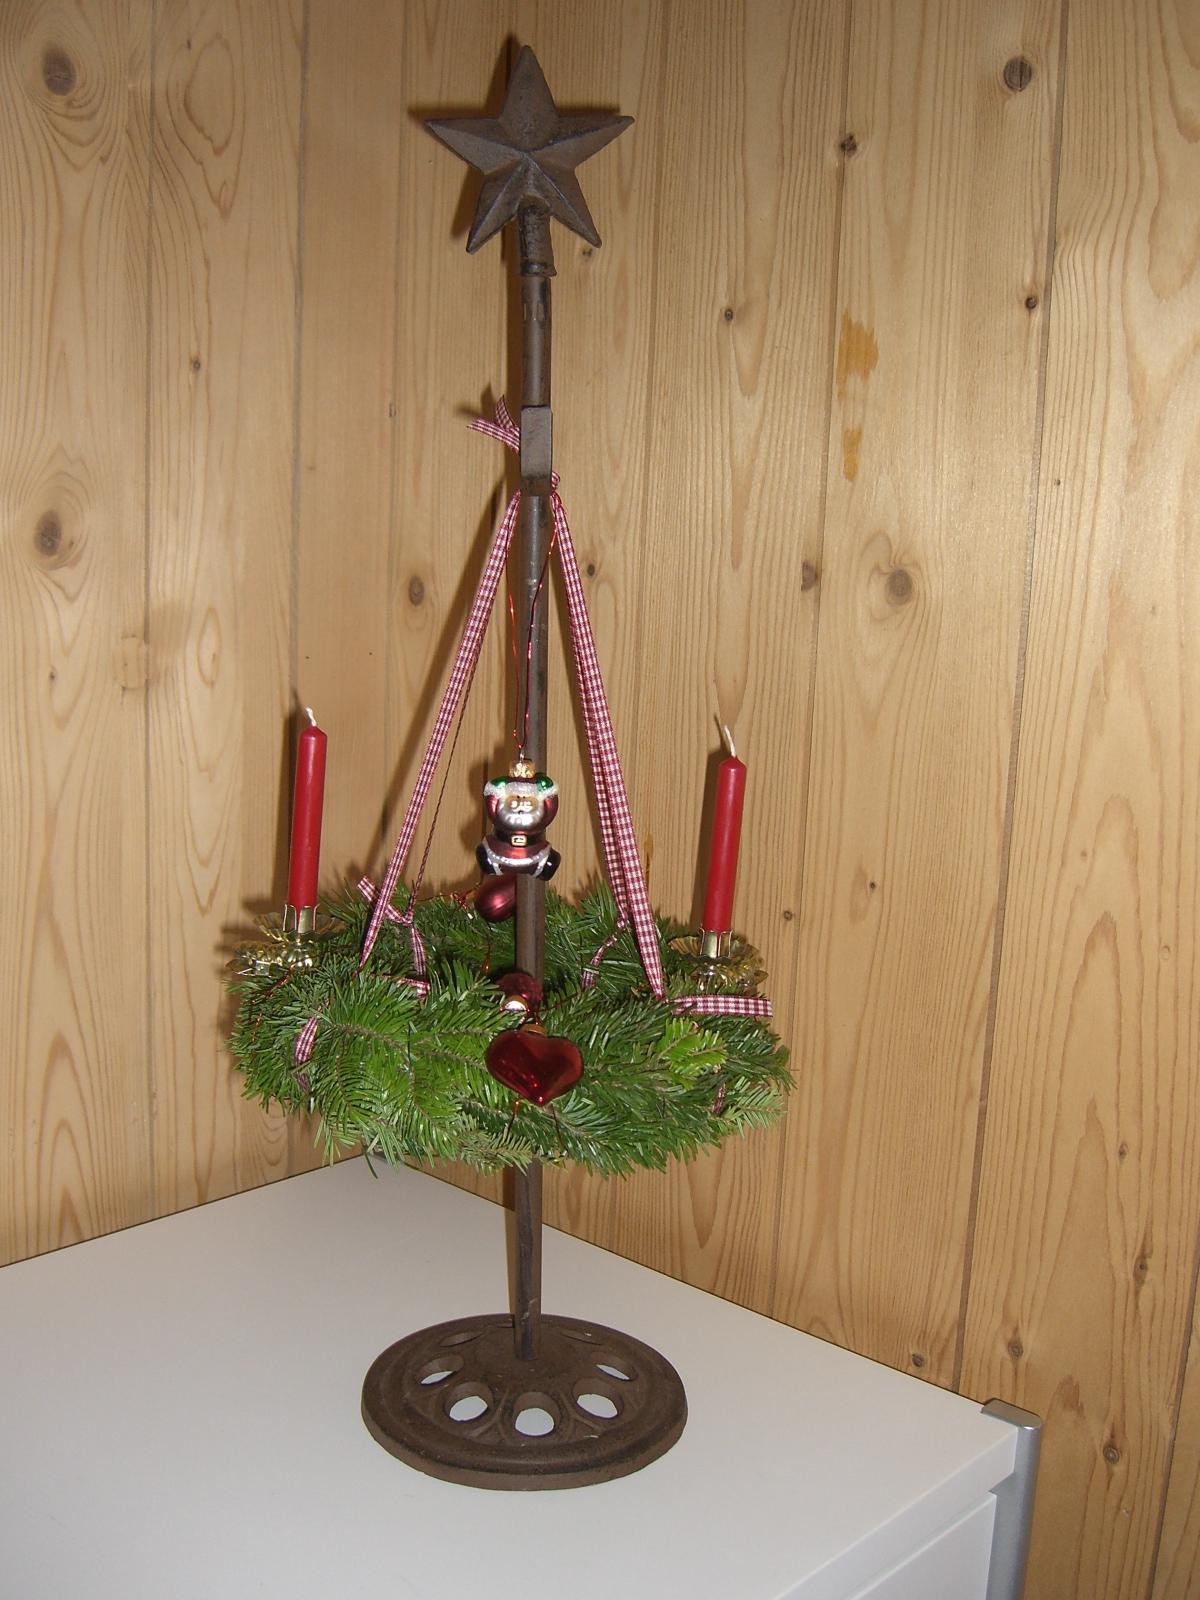 kiltdesign heute adventszauber nicht vergessen. Black Bedroom Furniture Sets. Home Design Ideas